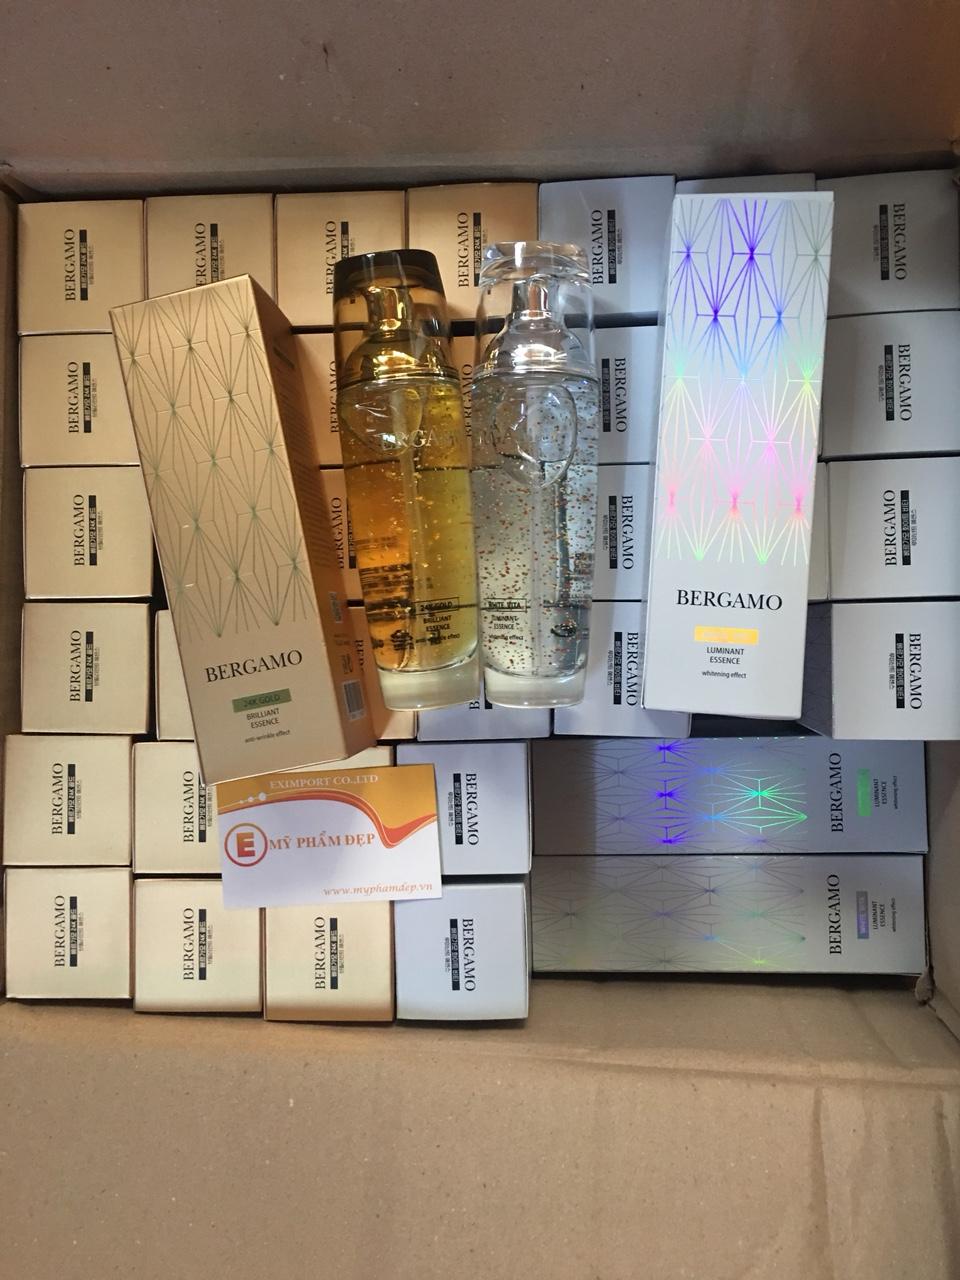 serum-duong-da-tinh-chat-duong-da-serum-bergamo-24k-gold-brilliant-essence-han-quoc-110-ml-2426